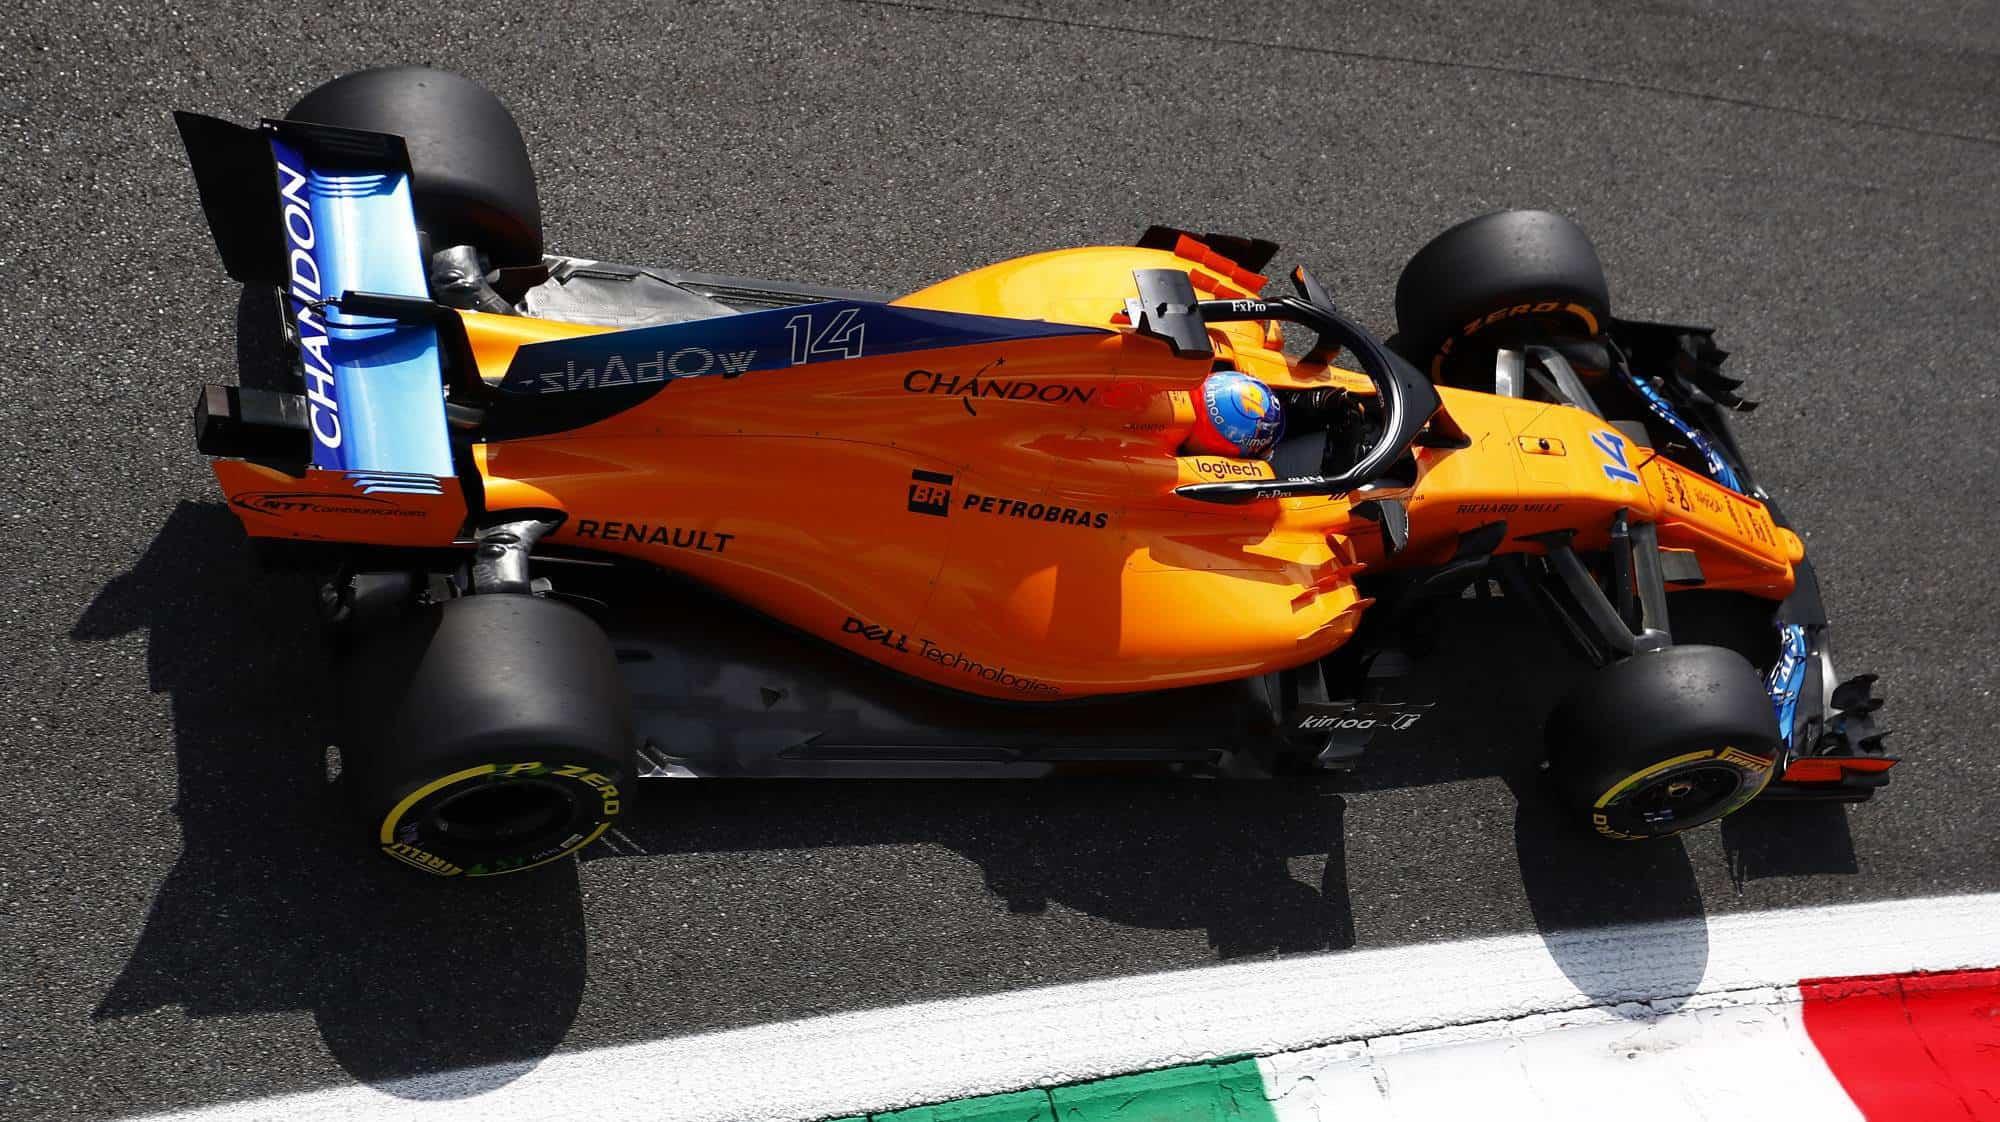 McLaren MCL33 rear wing rear end Parabolica Italian GP F1 2018 low downforce Photo McLaren